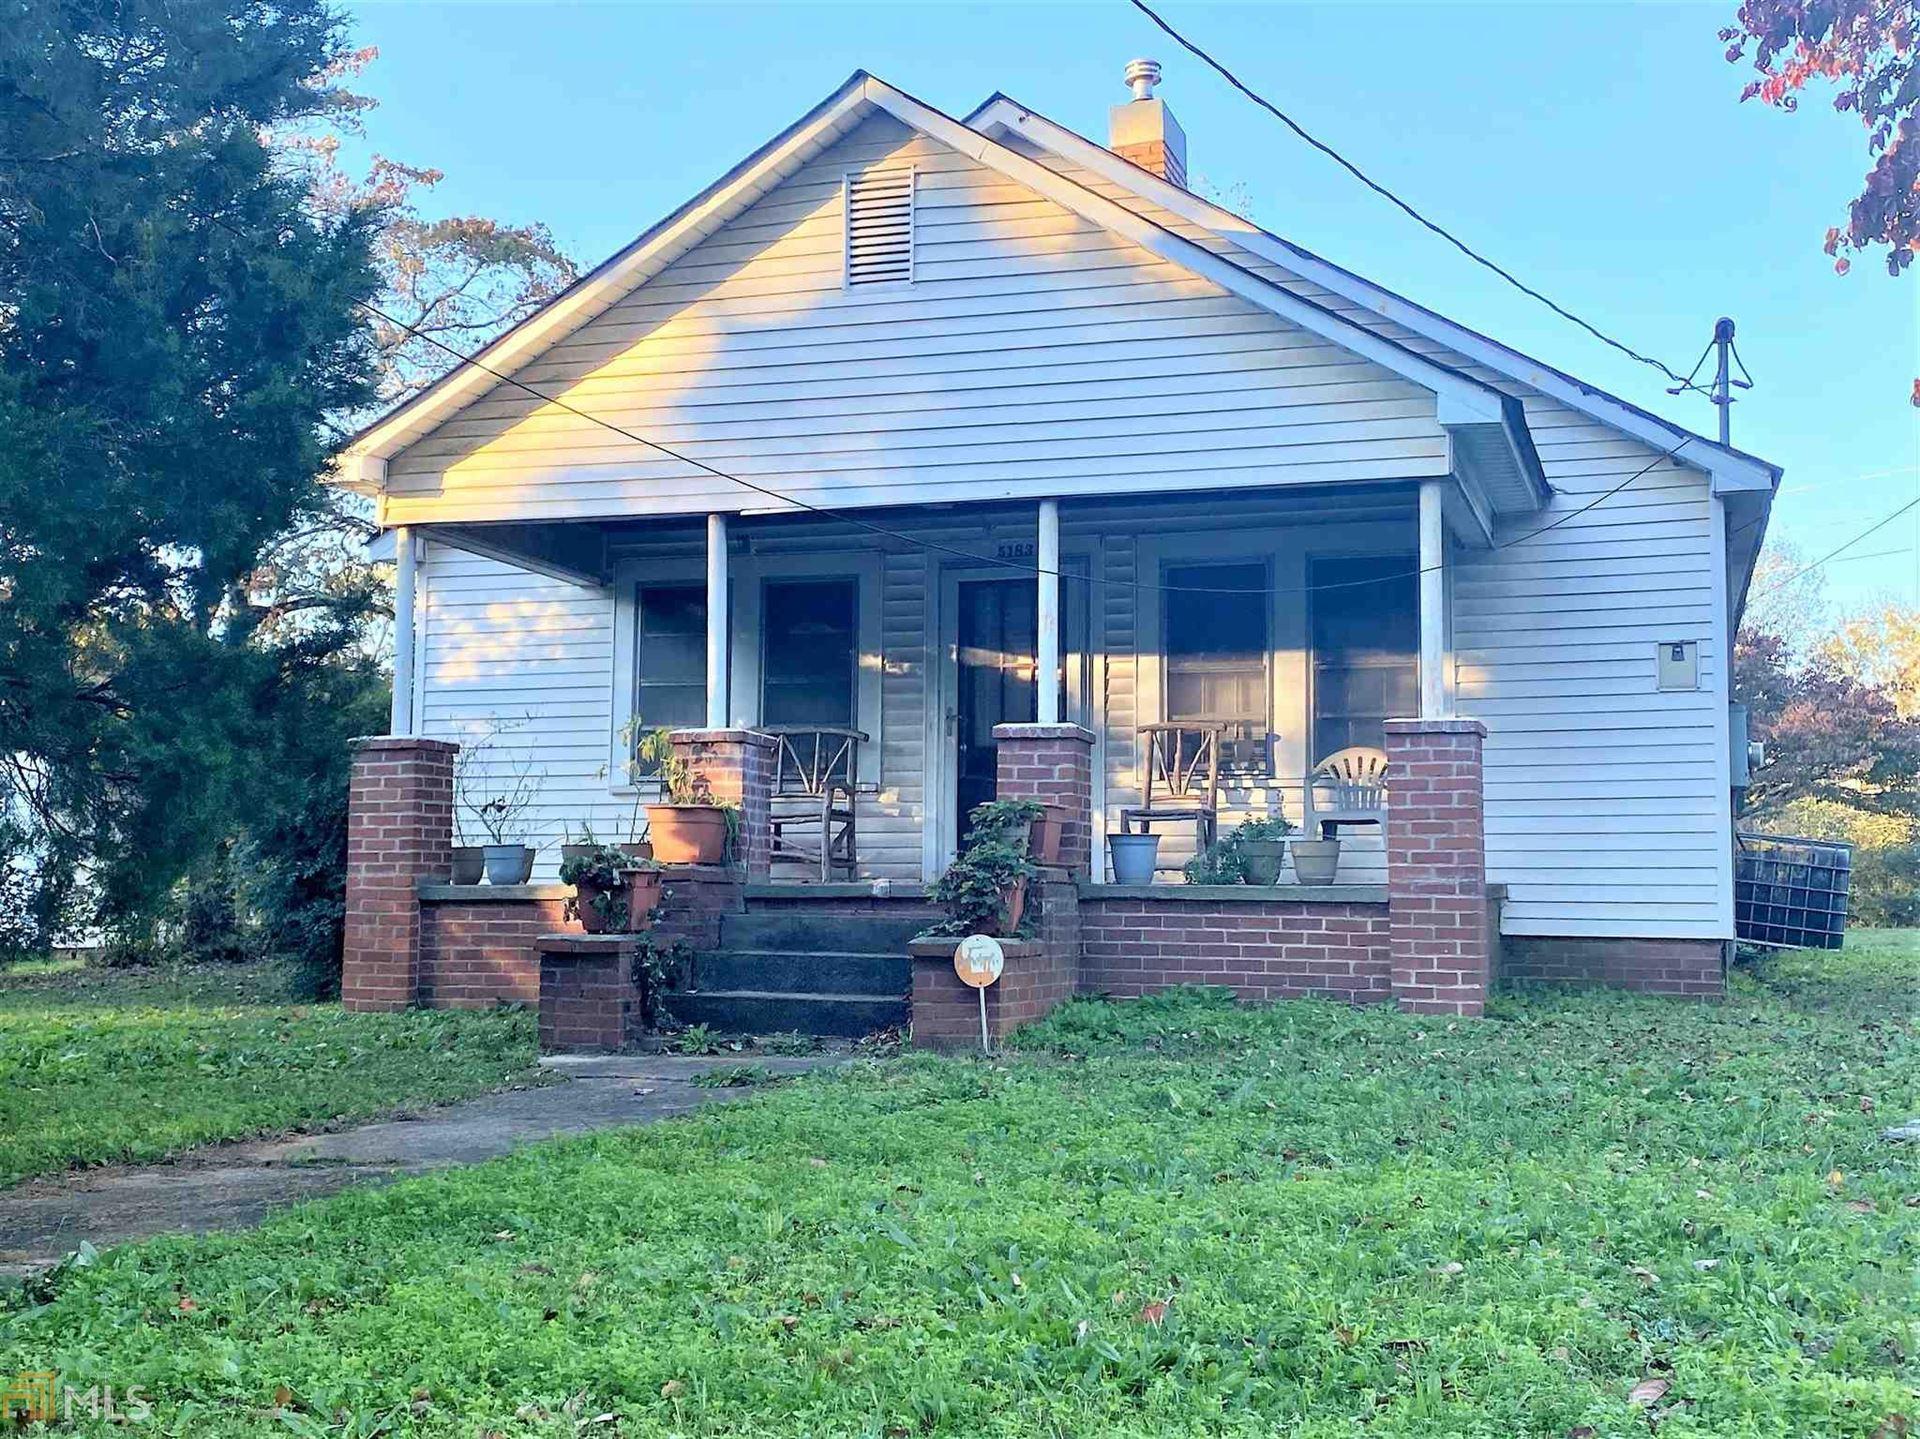 5183 Emory St, Covington, GA 30014 - #: 8891986